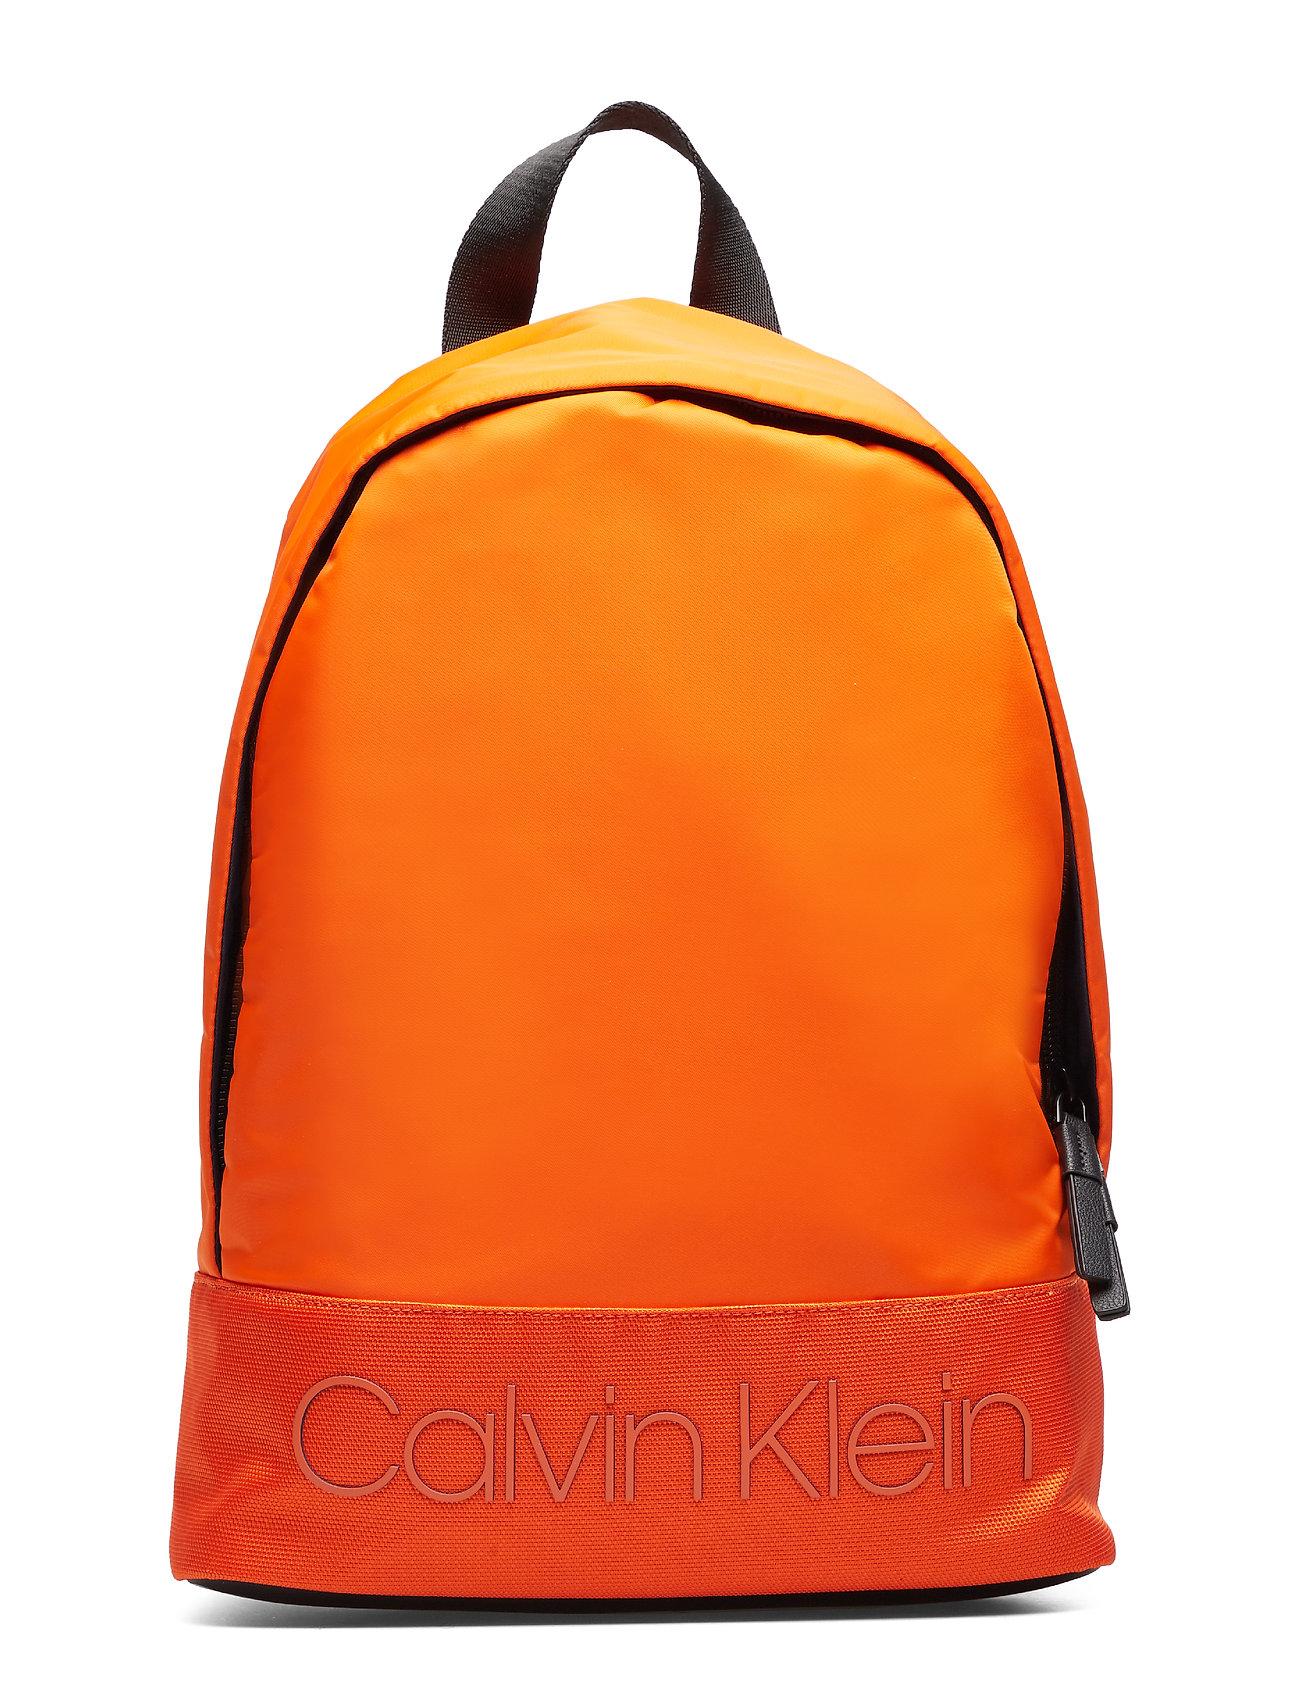 Calvin Klein SHADOW ROUND BACKPAC - ORANGE PEEL